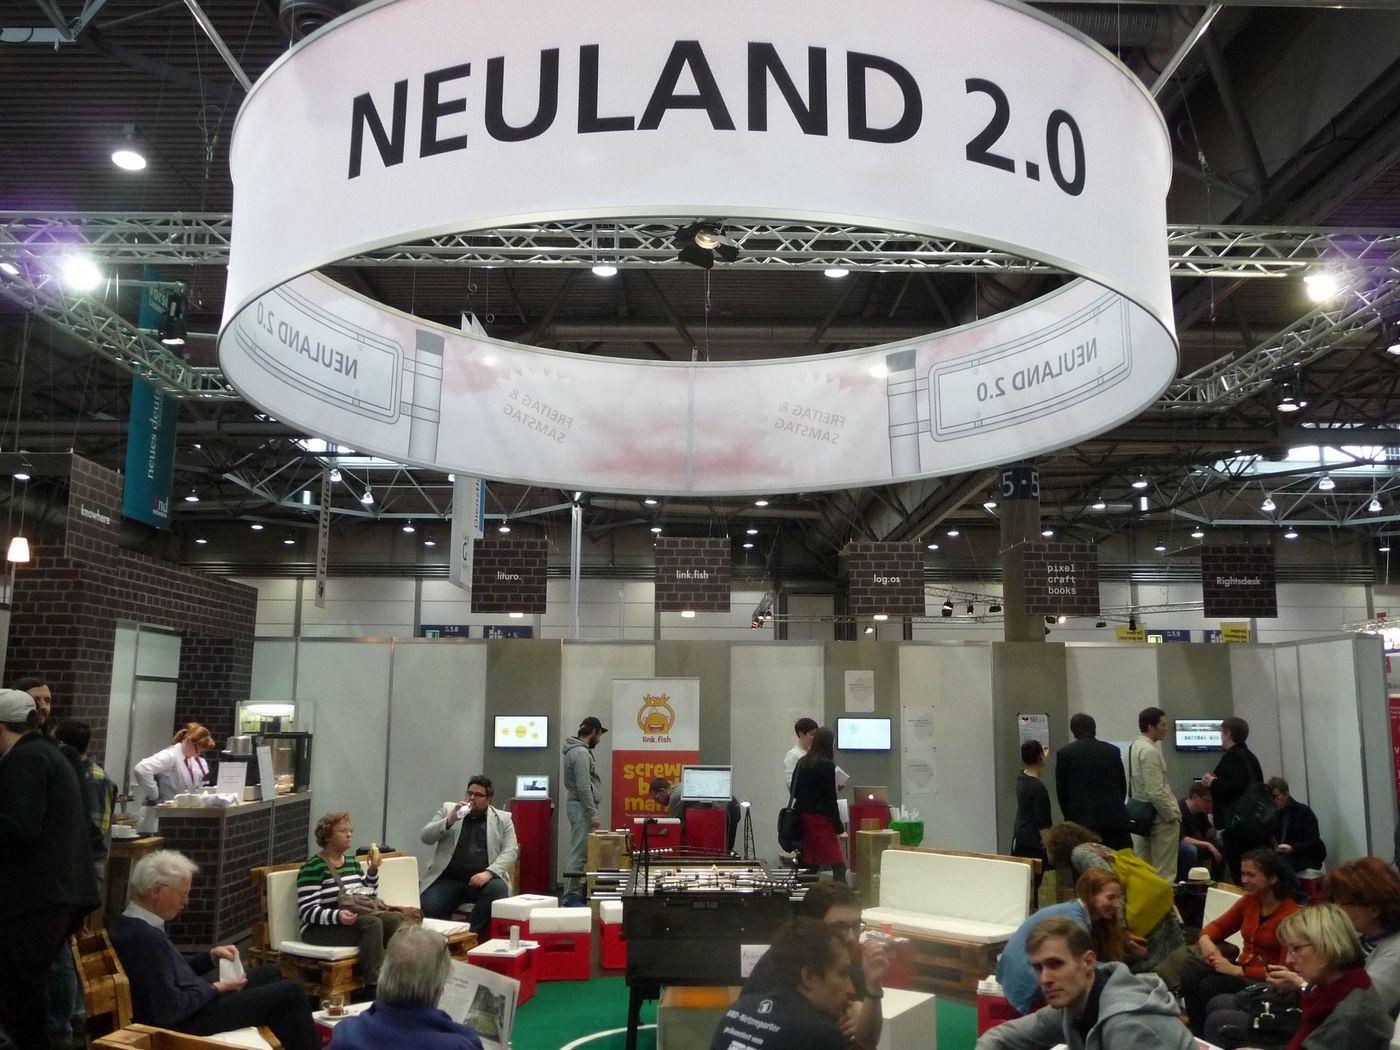 Fórum Neuland 2.0